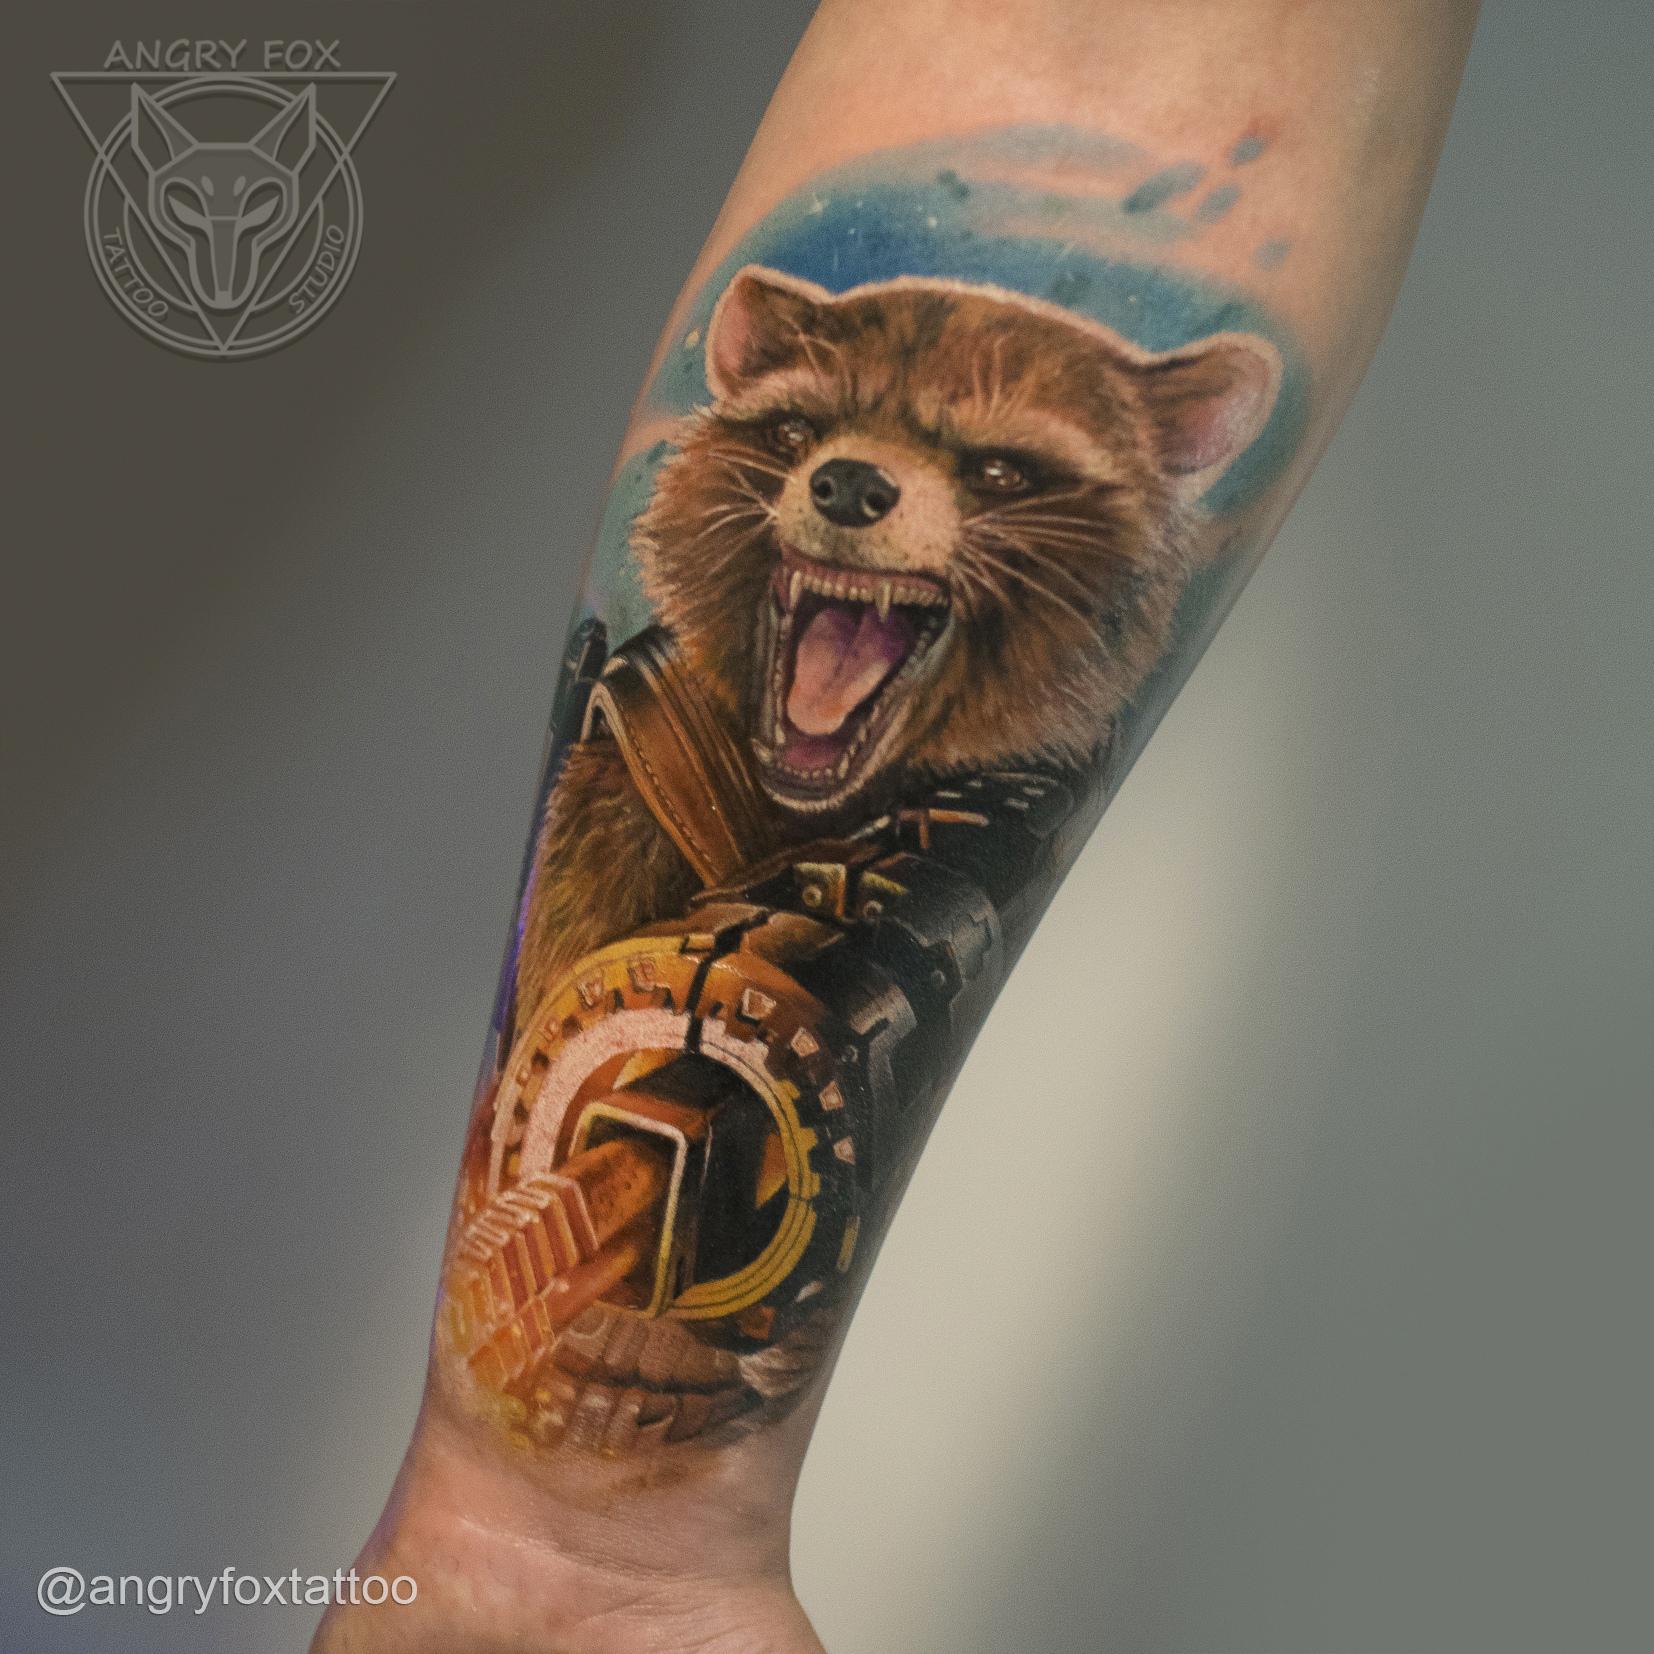 Татуировка, тату, рука, предплечье, енот, ракета, мстители, стражи, галактики, guardians, galaxy, avengers, реализм